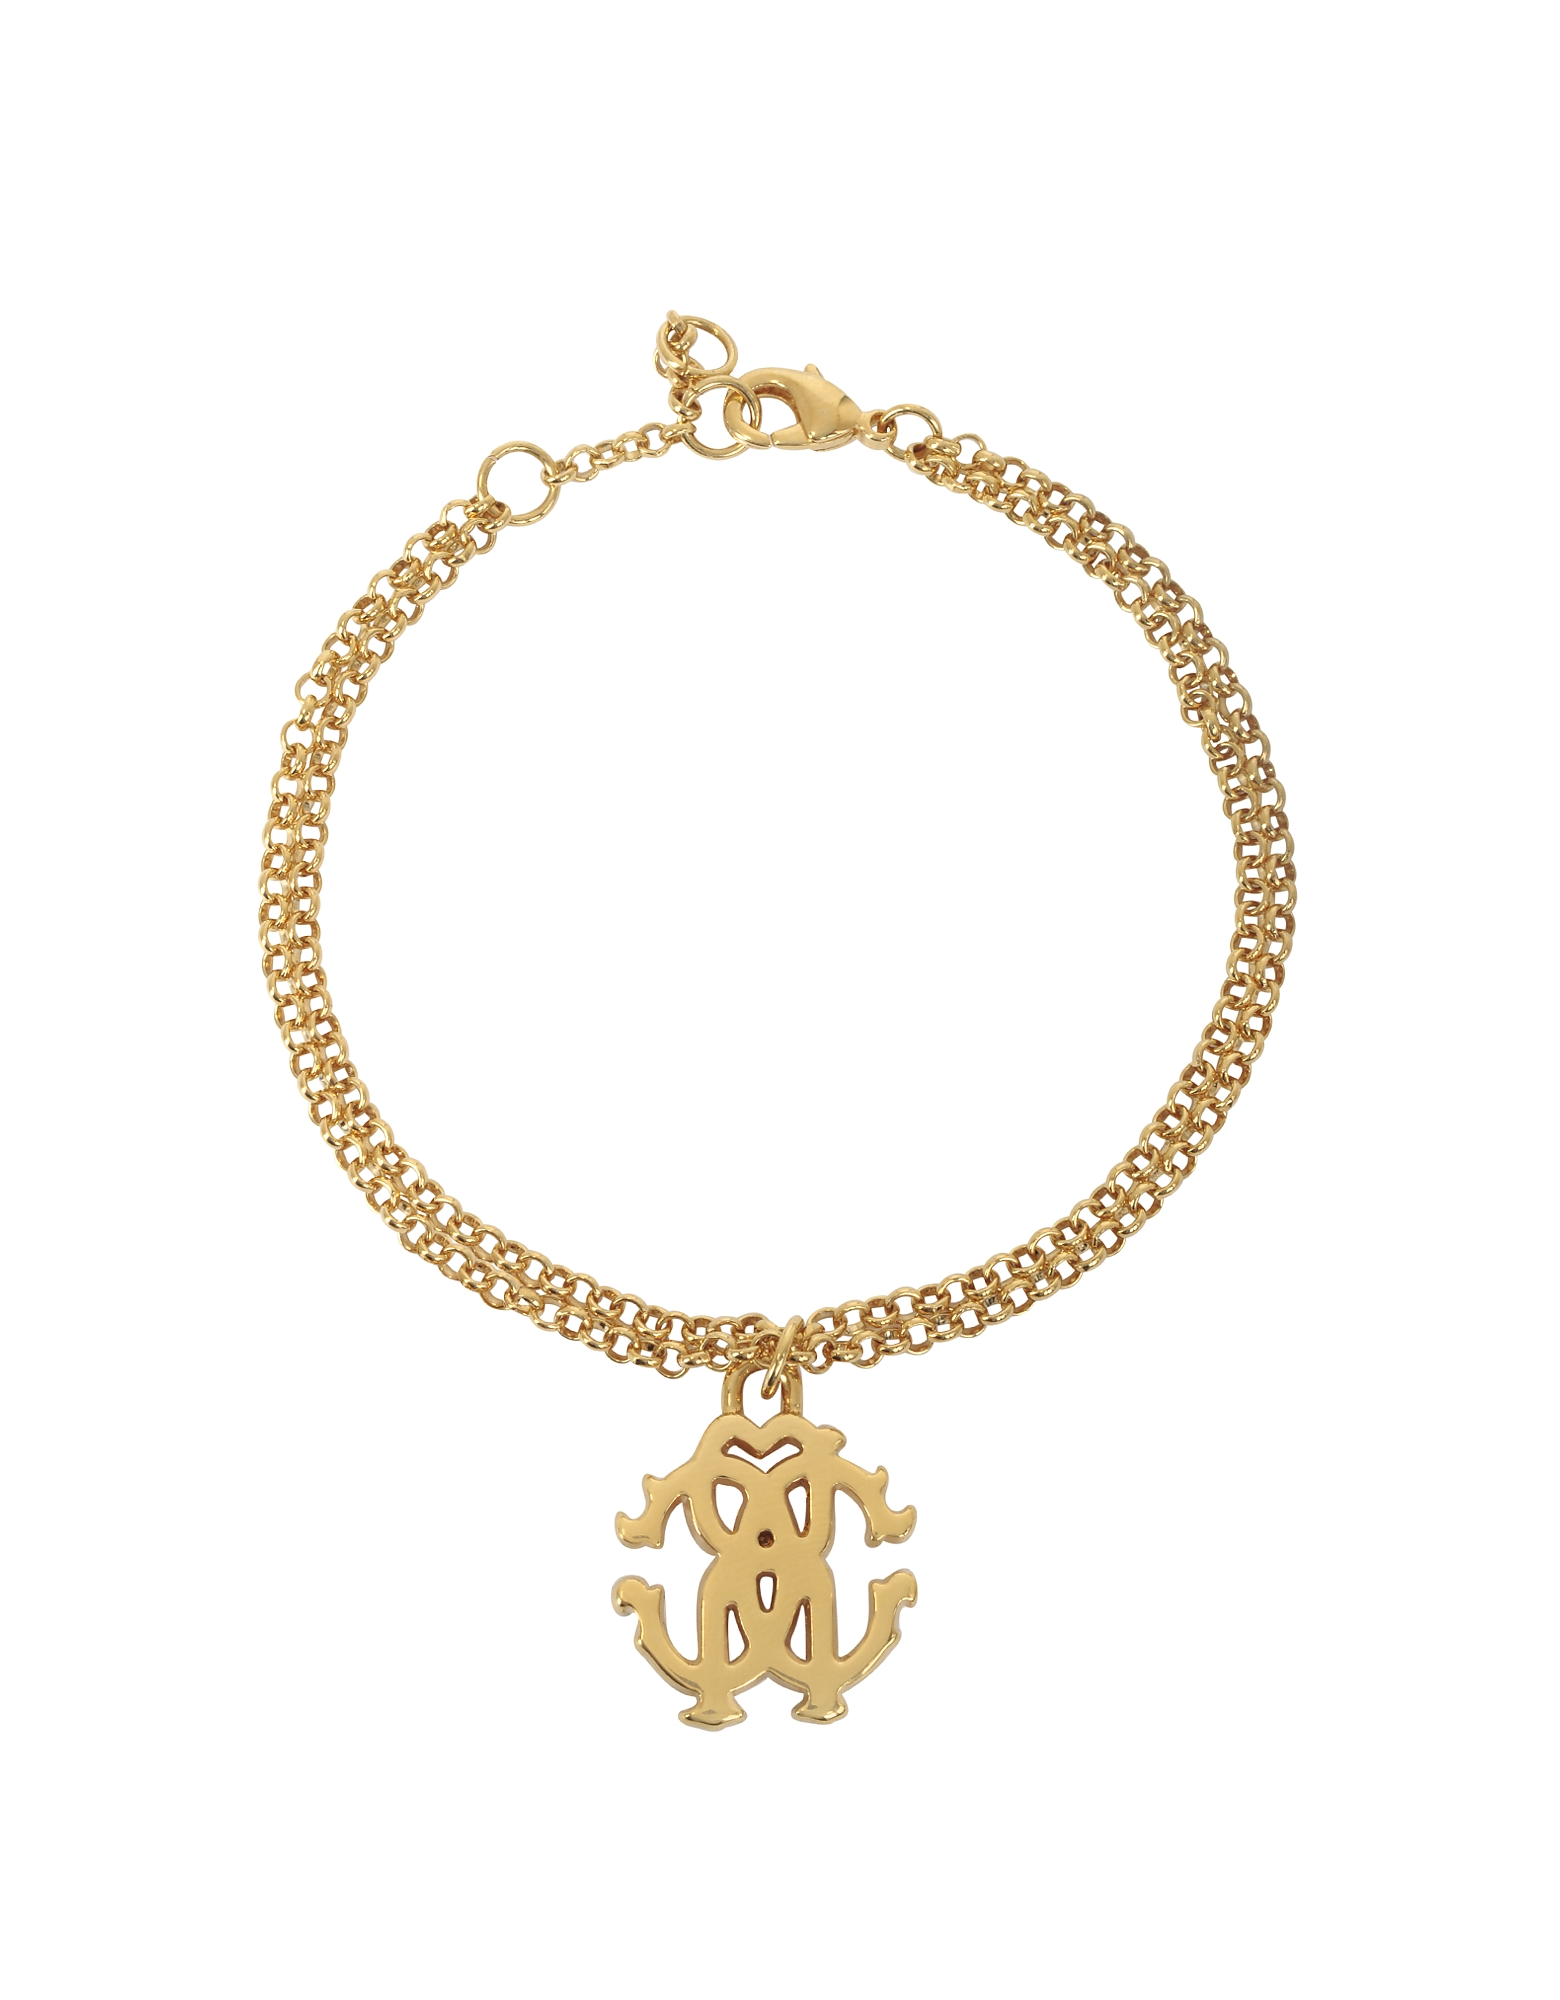 Roberto Cavalli Bracelets, RC Icon Golden Metal Bracelet